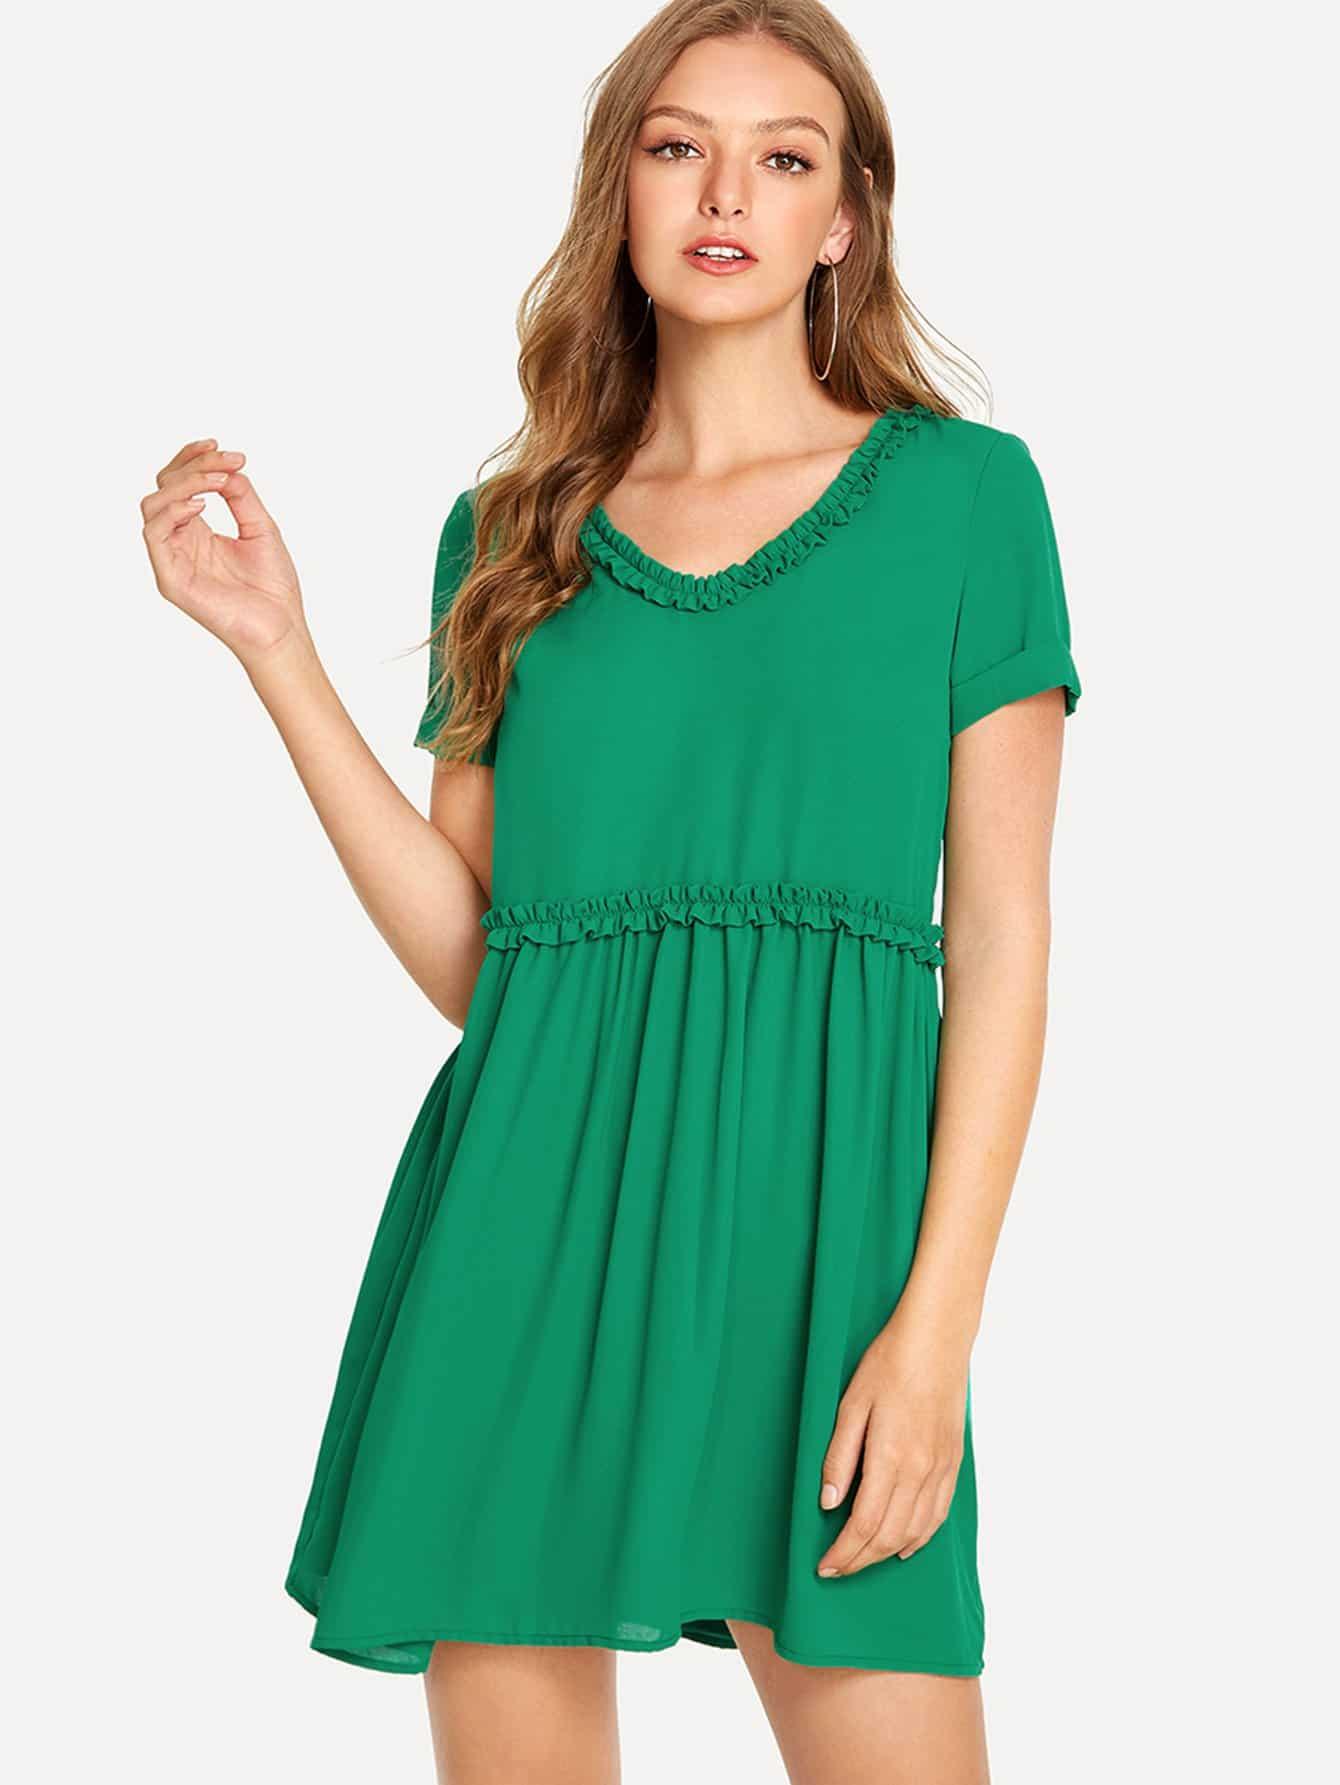 Frill Detail Smock Dress corduroy babydoll smock dress